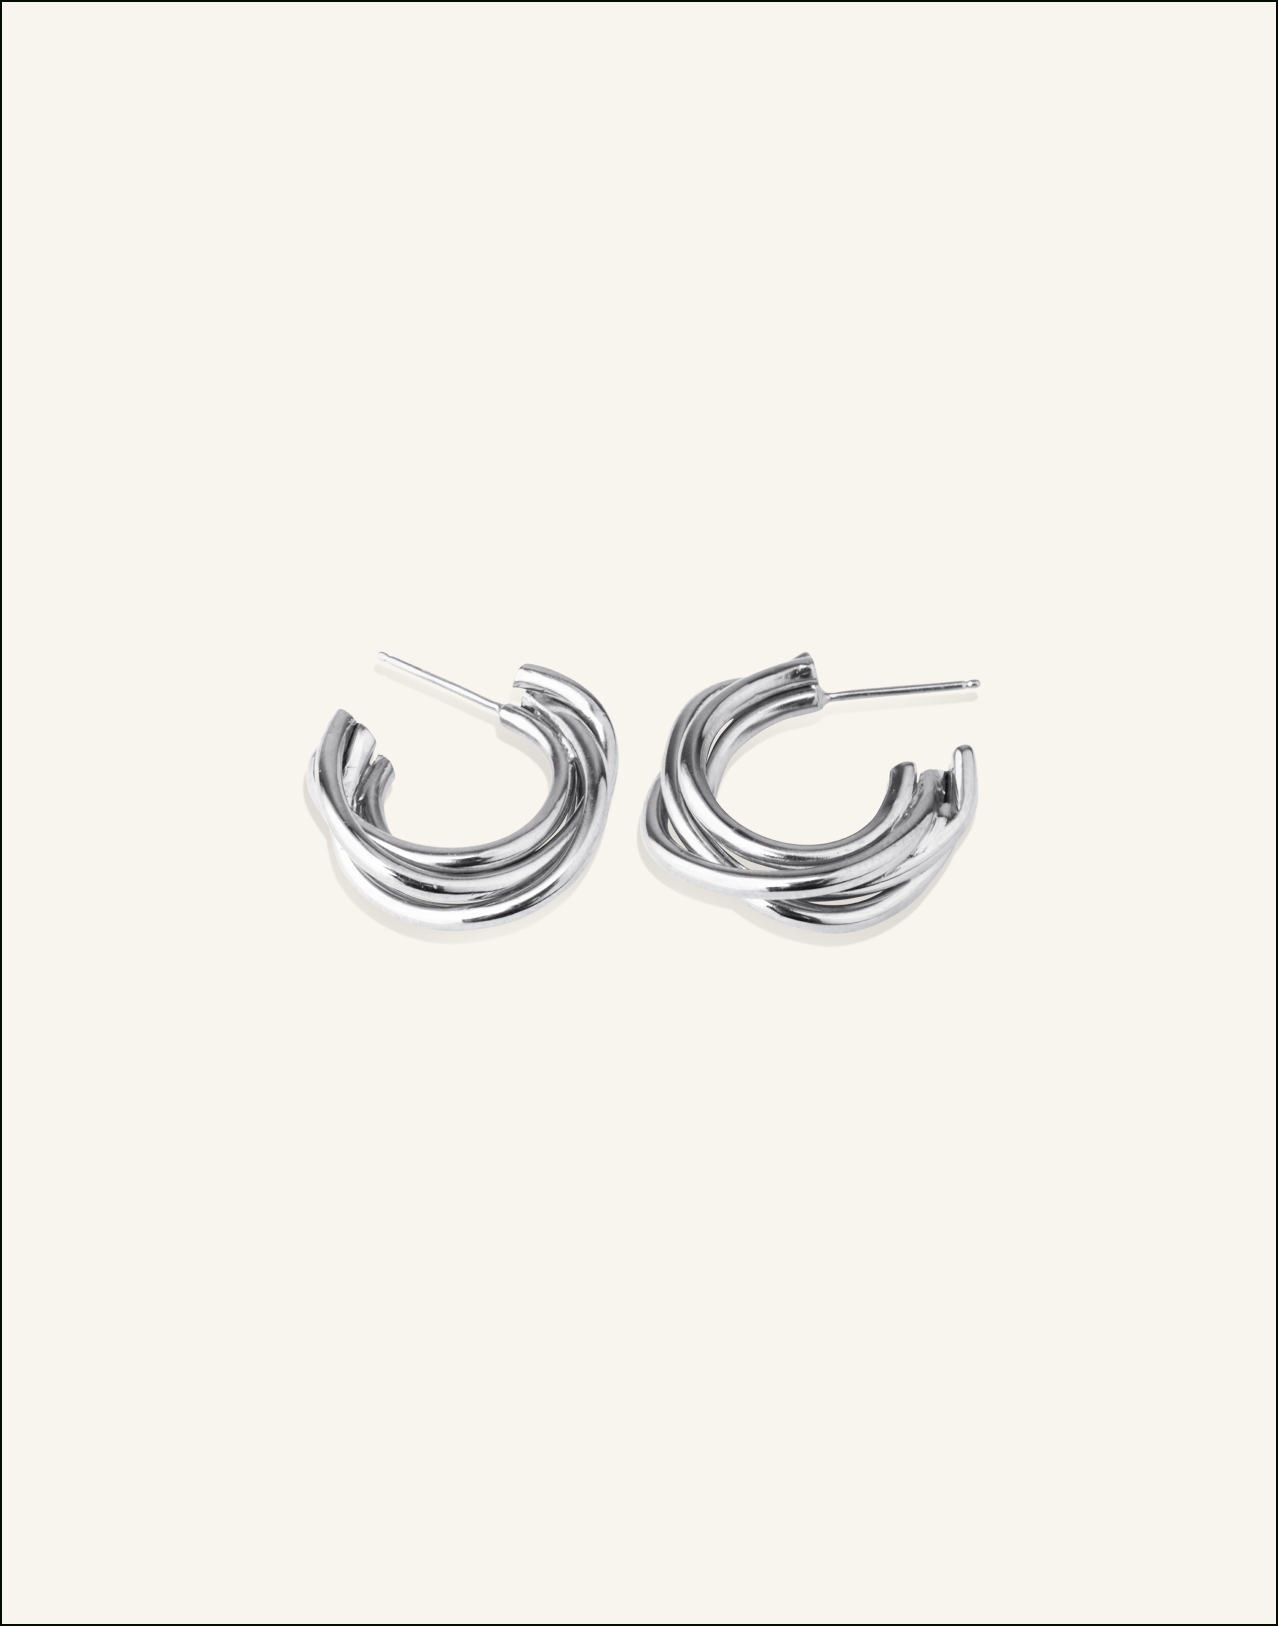 Completedworks-Silver-Earrings-An-Encounter-4-1.jpg